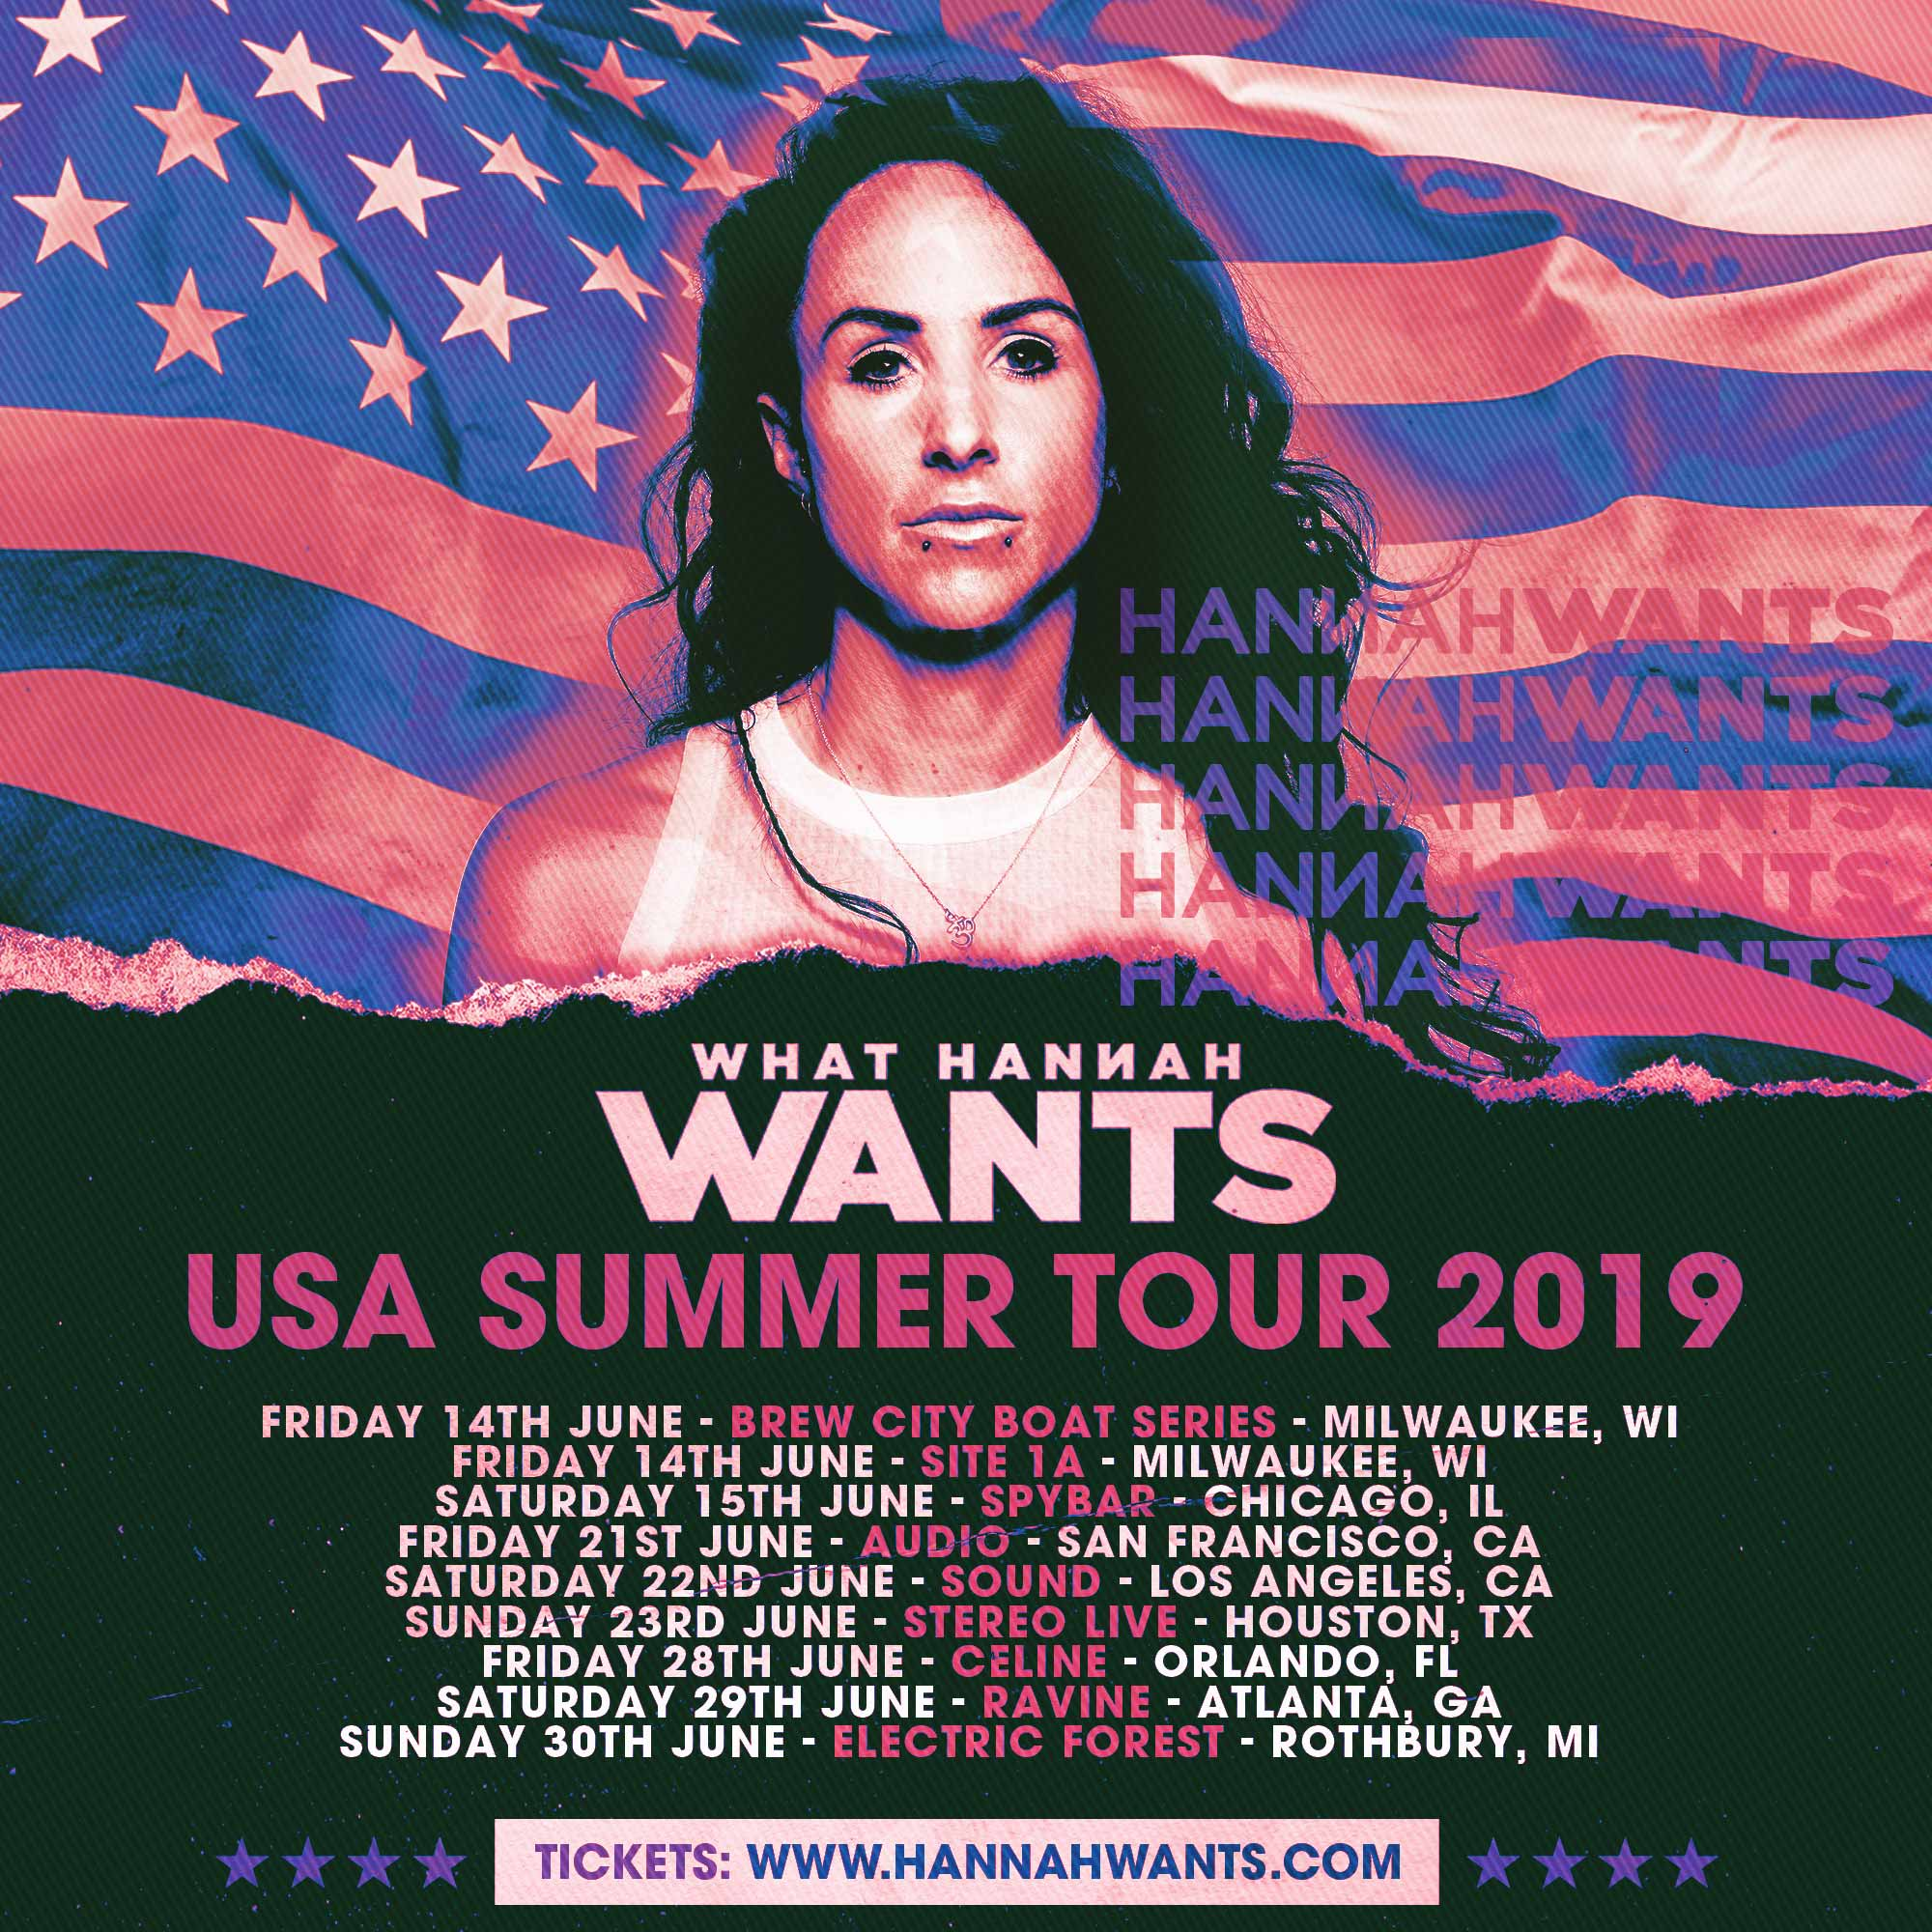 Hannah Wants USA Summer Tour 2019